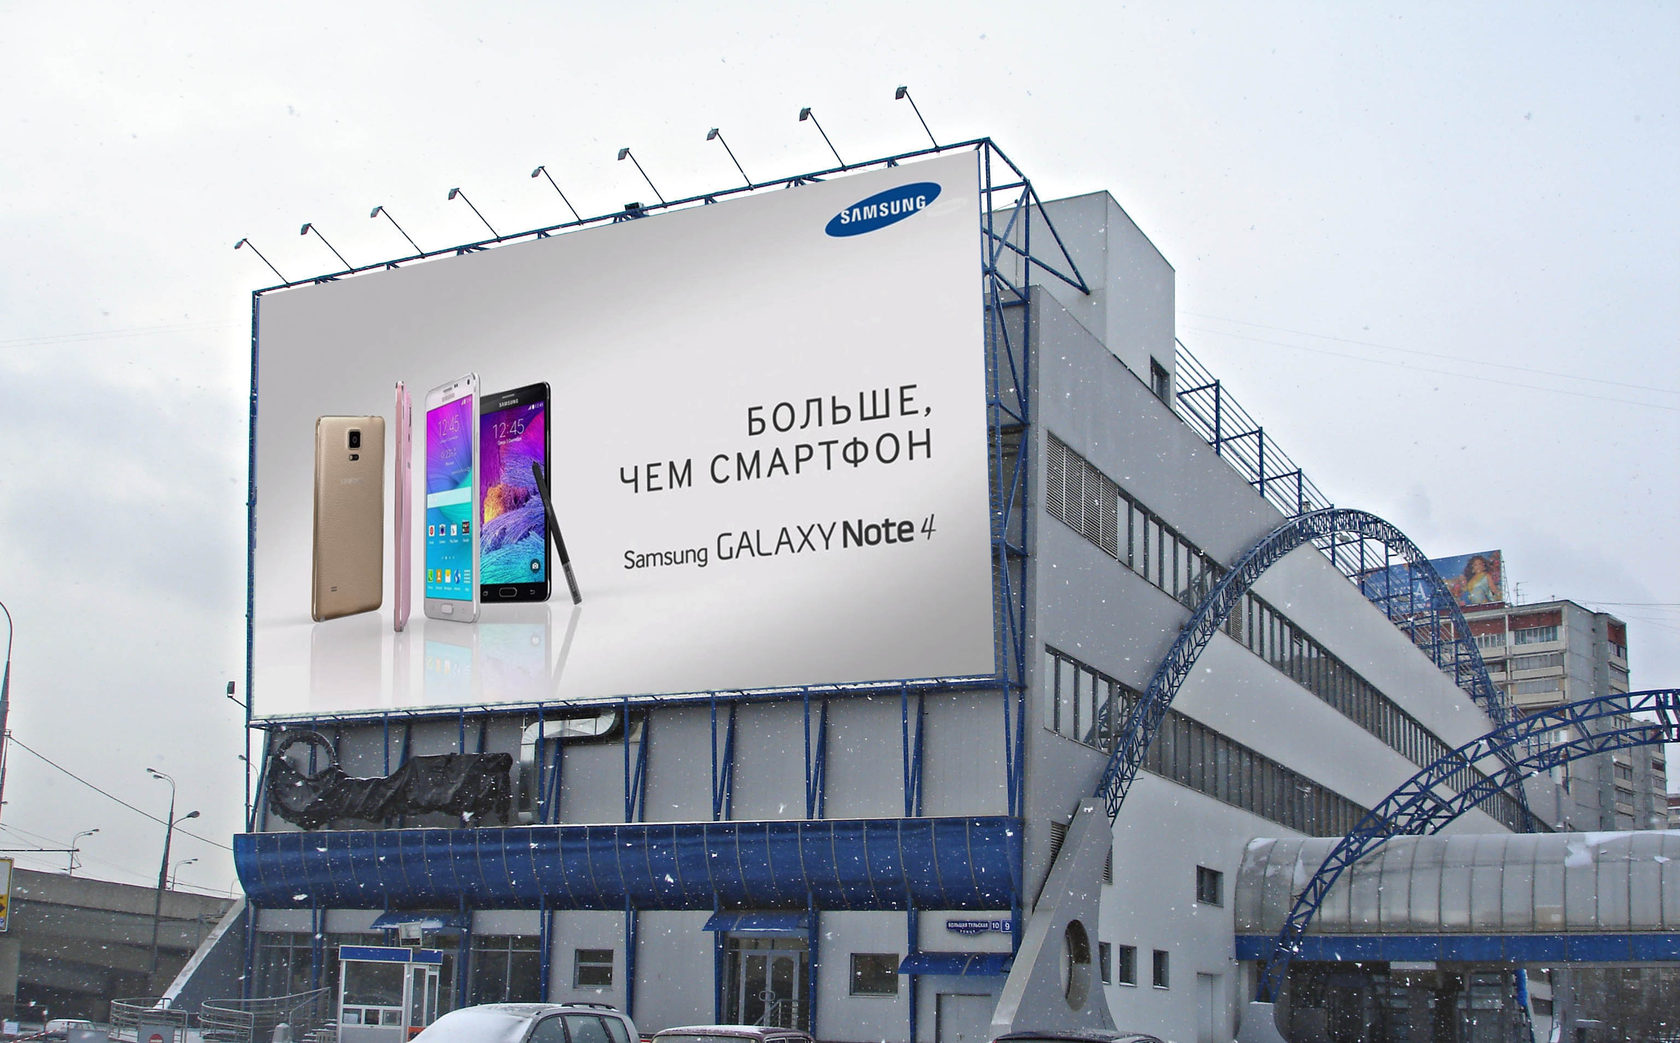 реклама на брандмауэрах в Краснодаре